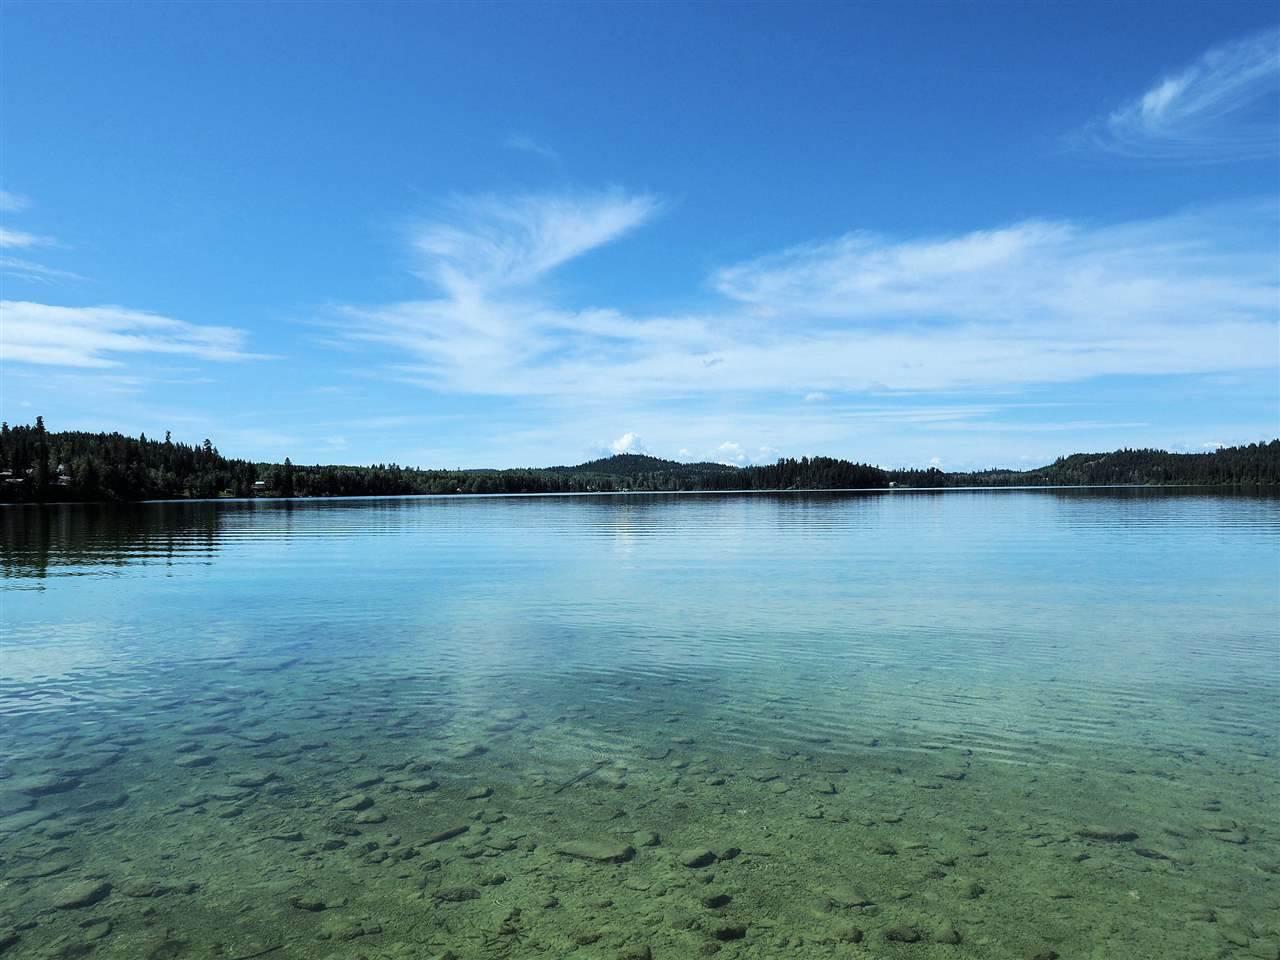 Photo 5: Photos: 8222 CENTENNIAL Road in Bridge Lake: Bridge Lake/Sheridan Lake House for sale (100 Mile House (Zone 10))  : MLS®# R2457362